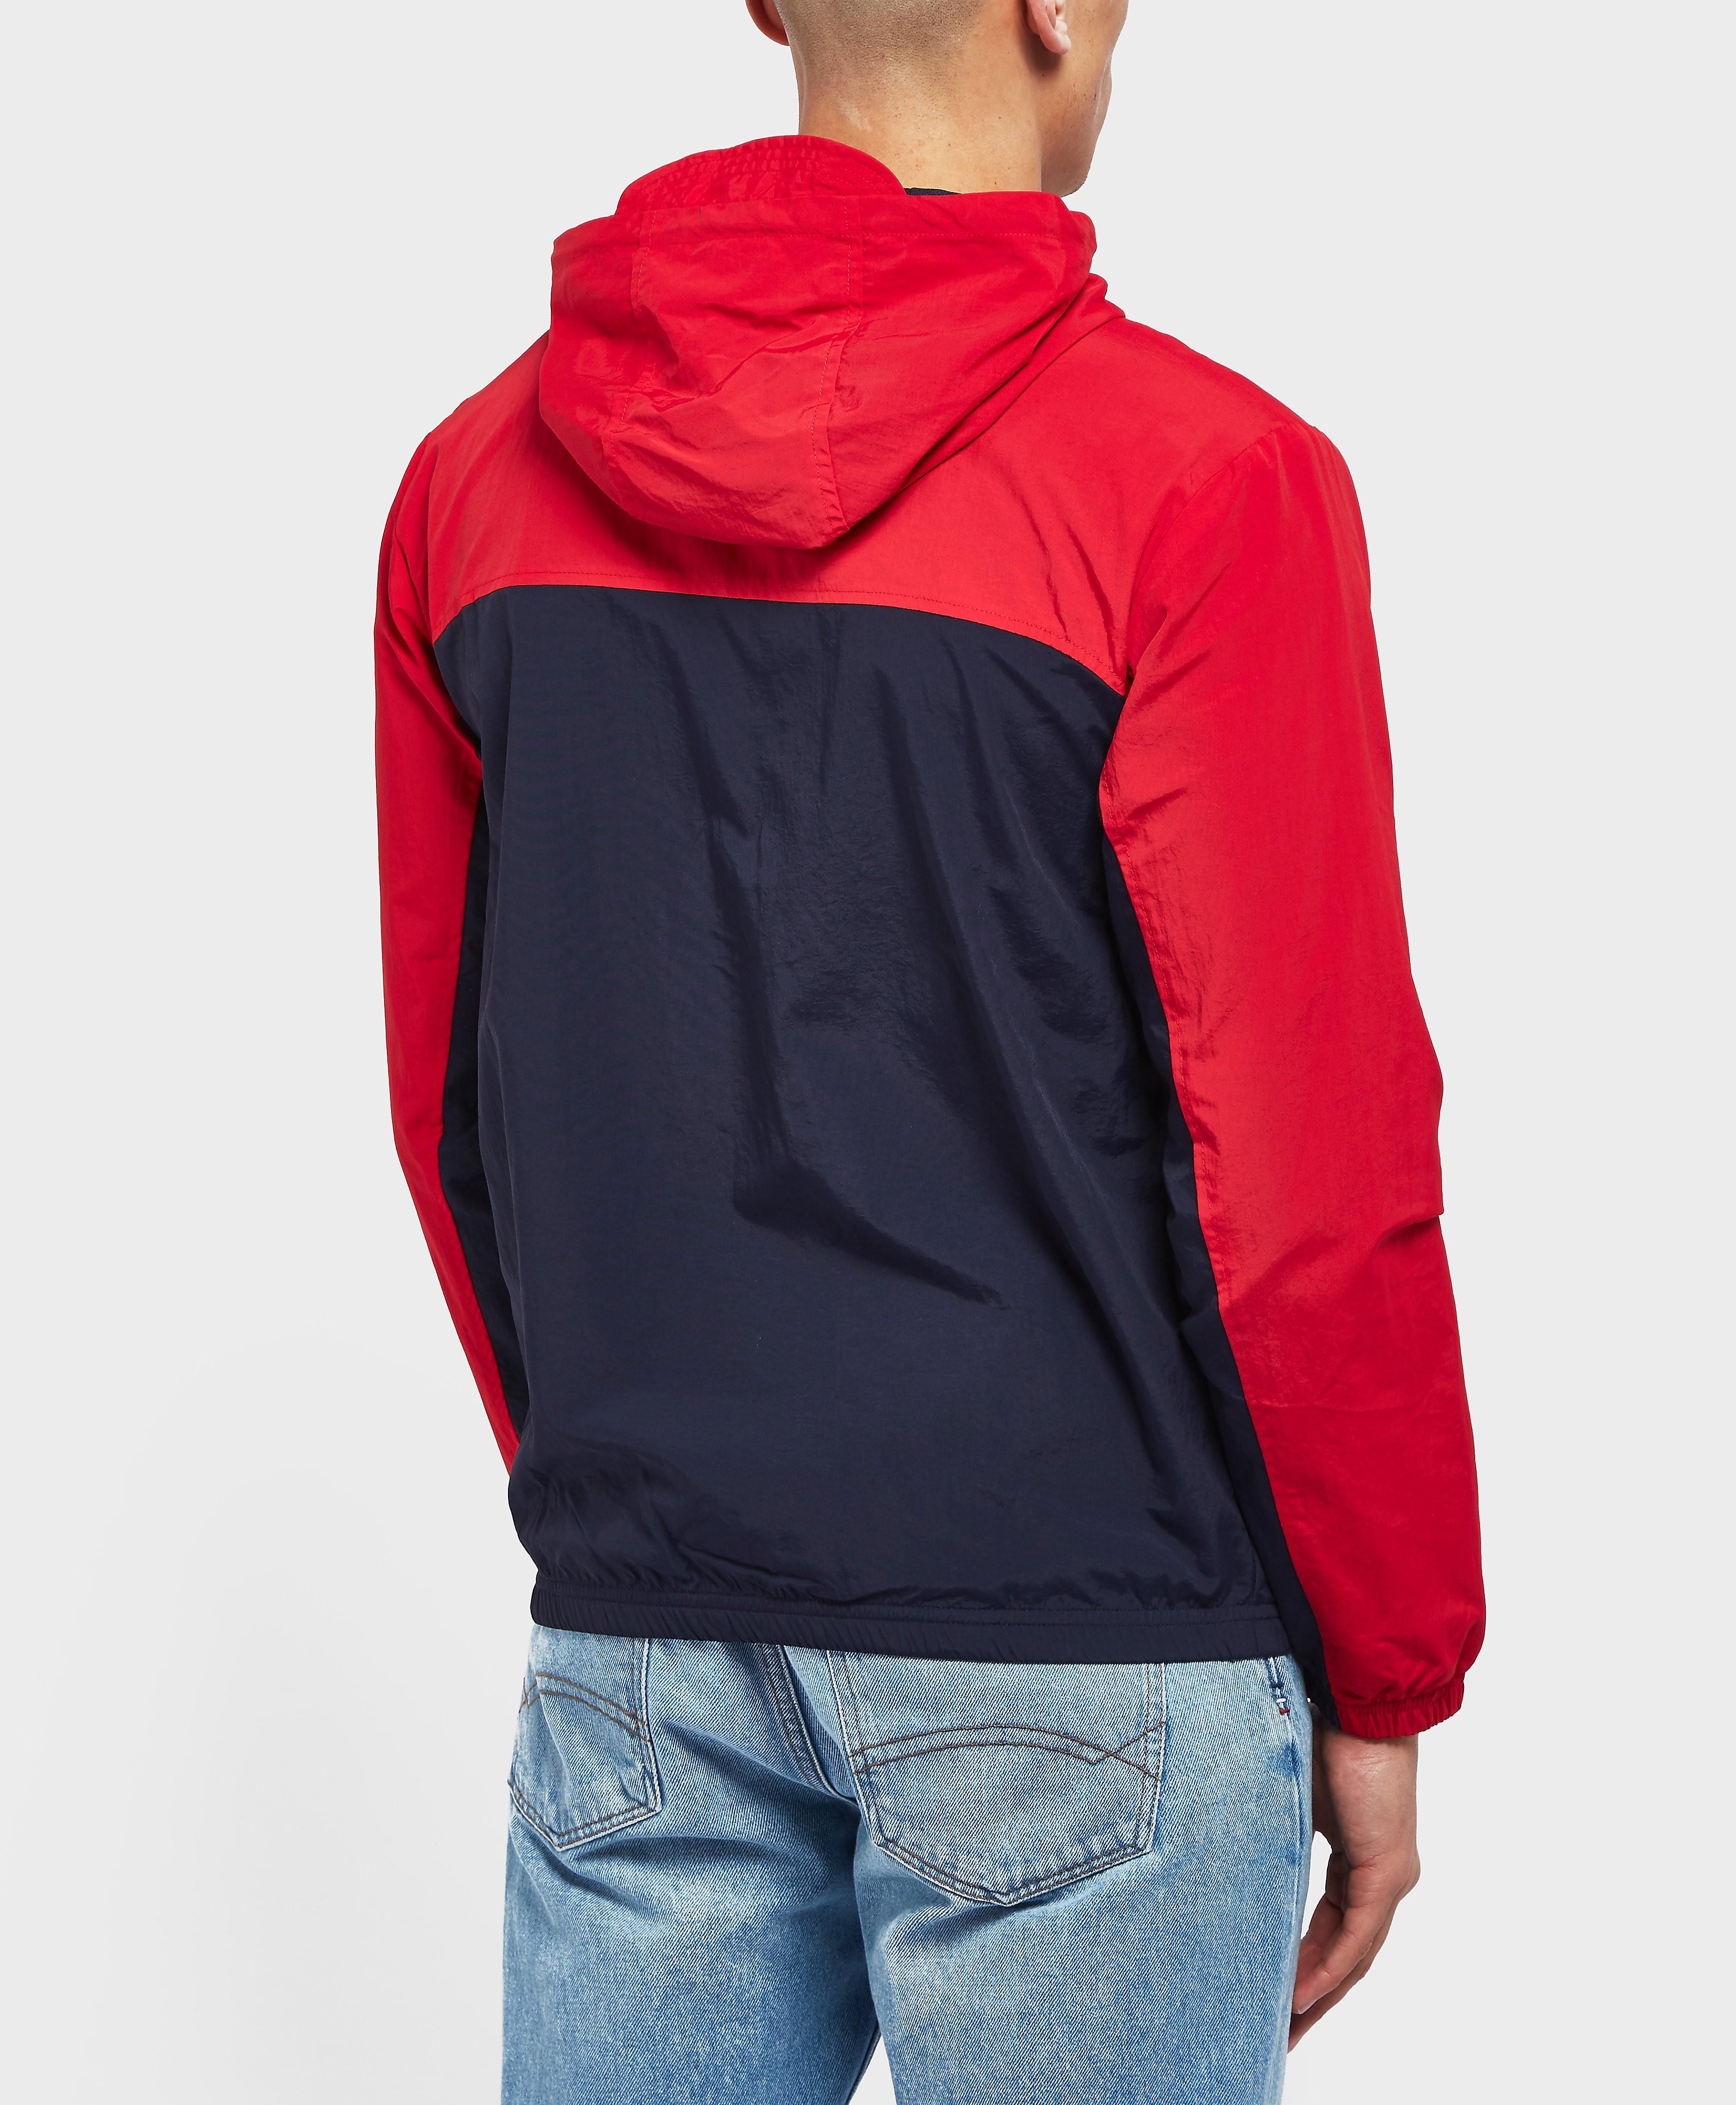 Fila Clipp Lightweight Jacket